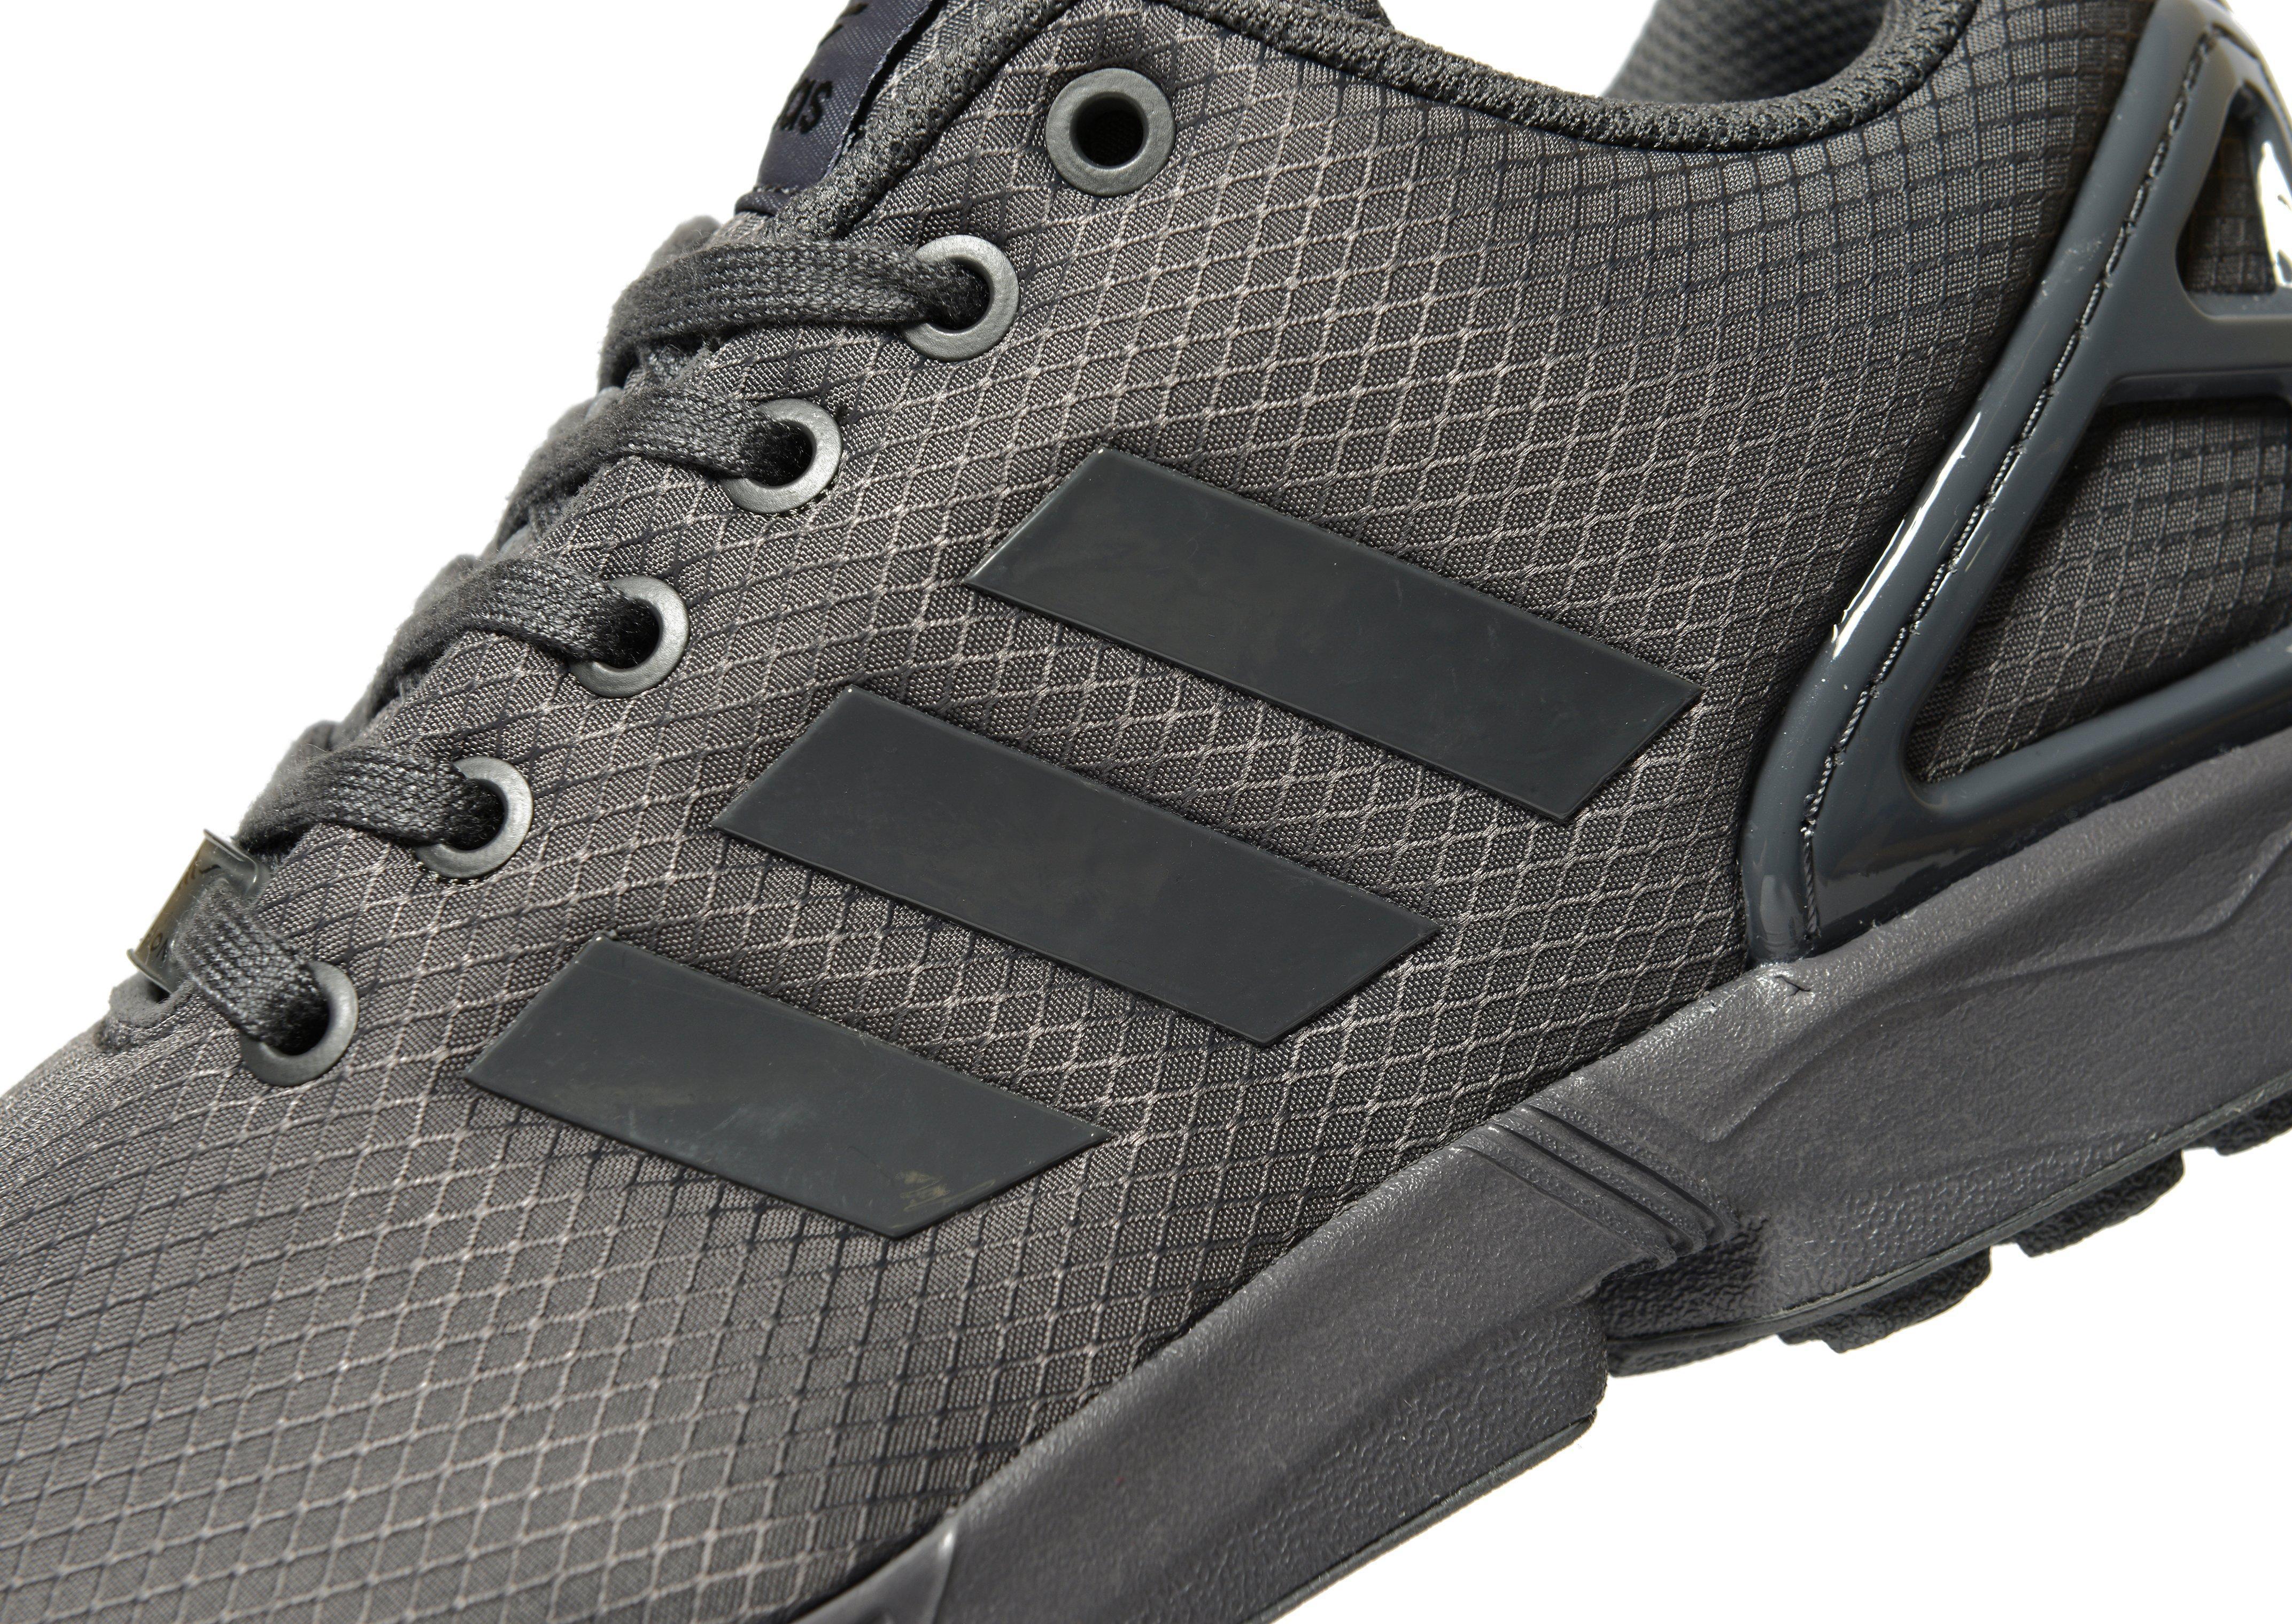 0b2157713649 Lyst - Adidas Originals Zx Flux Ripstop in Gray for Men